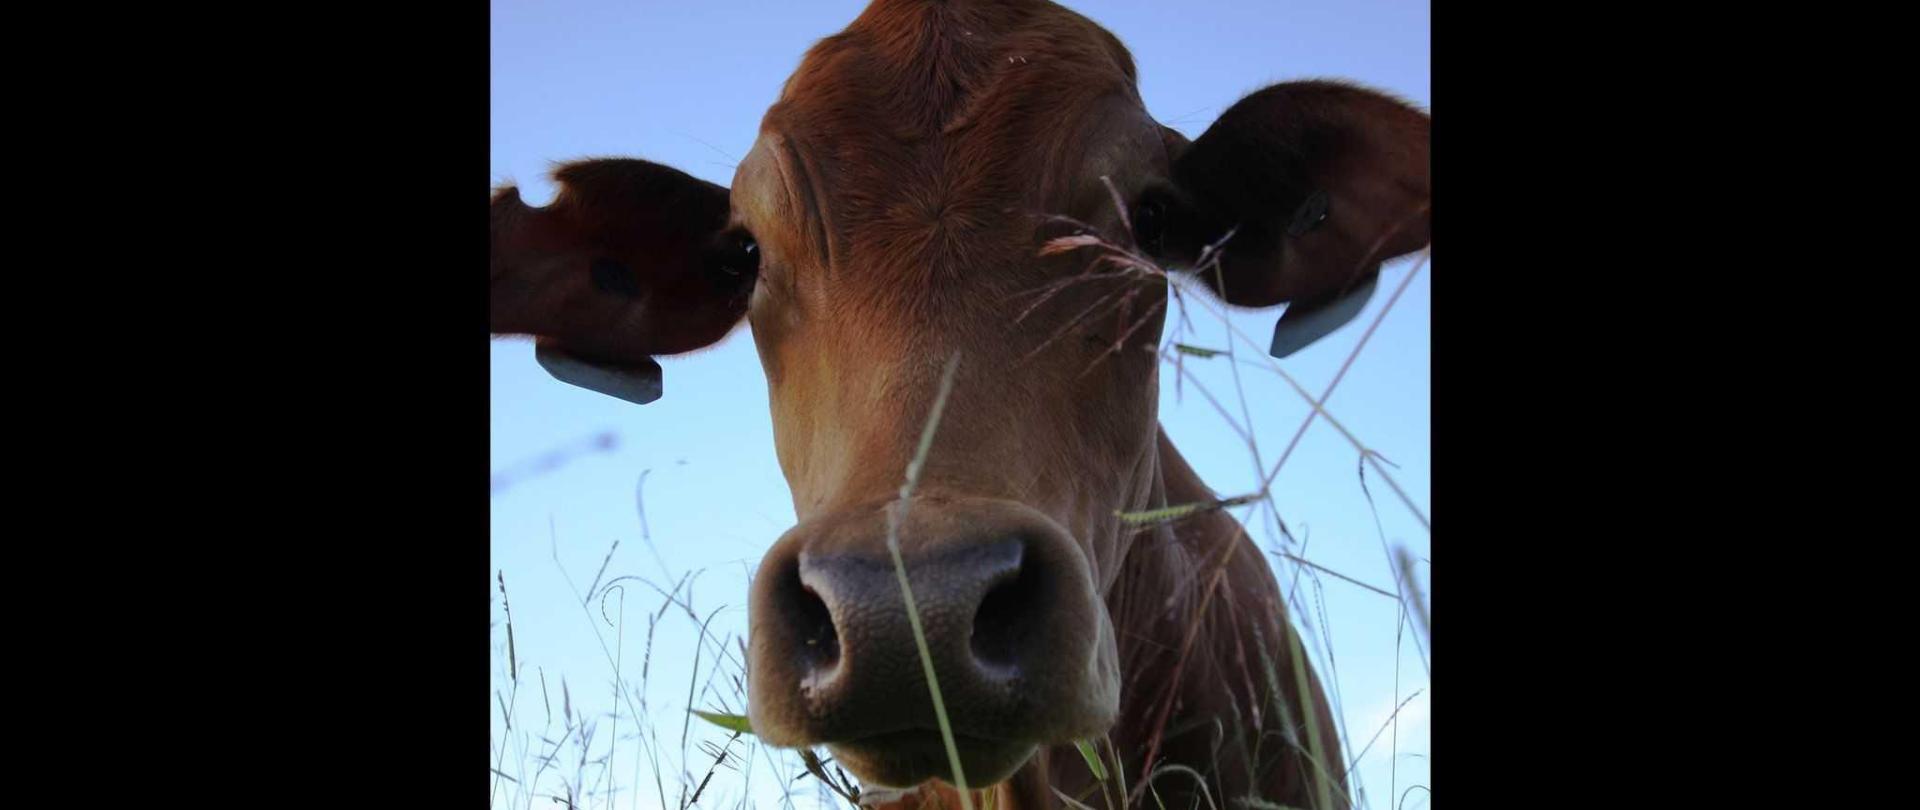 curious_cow-1.jpg